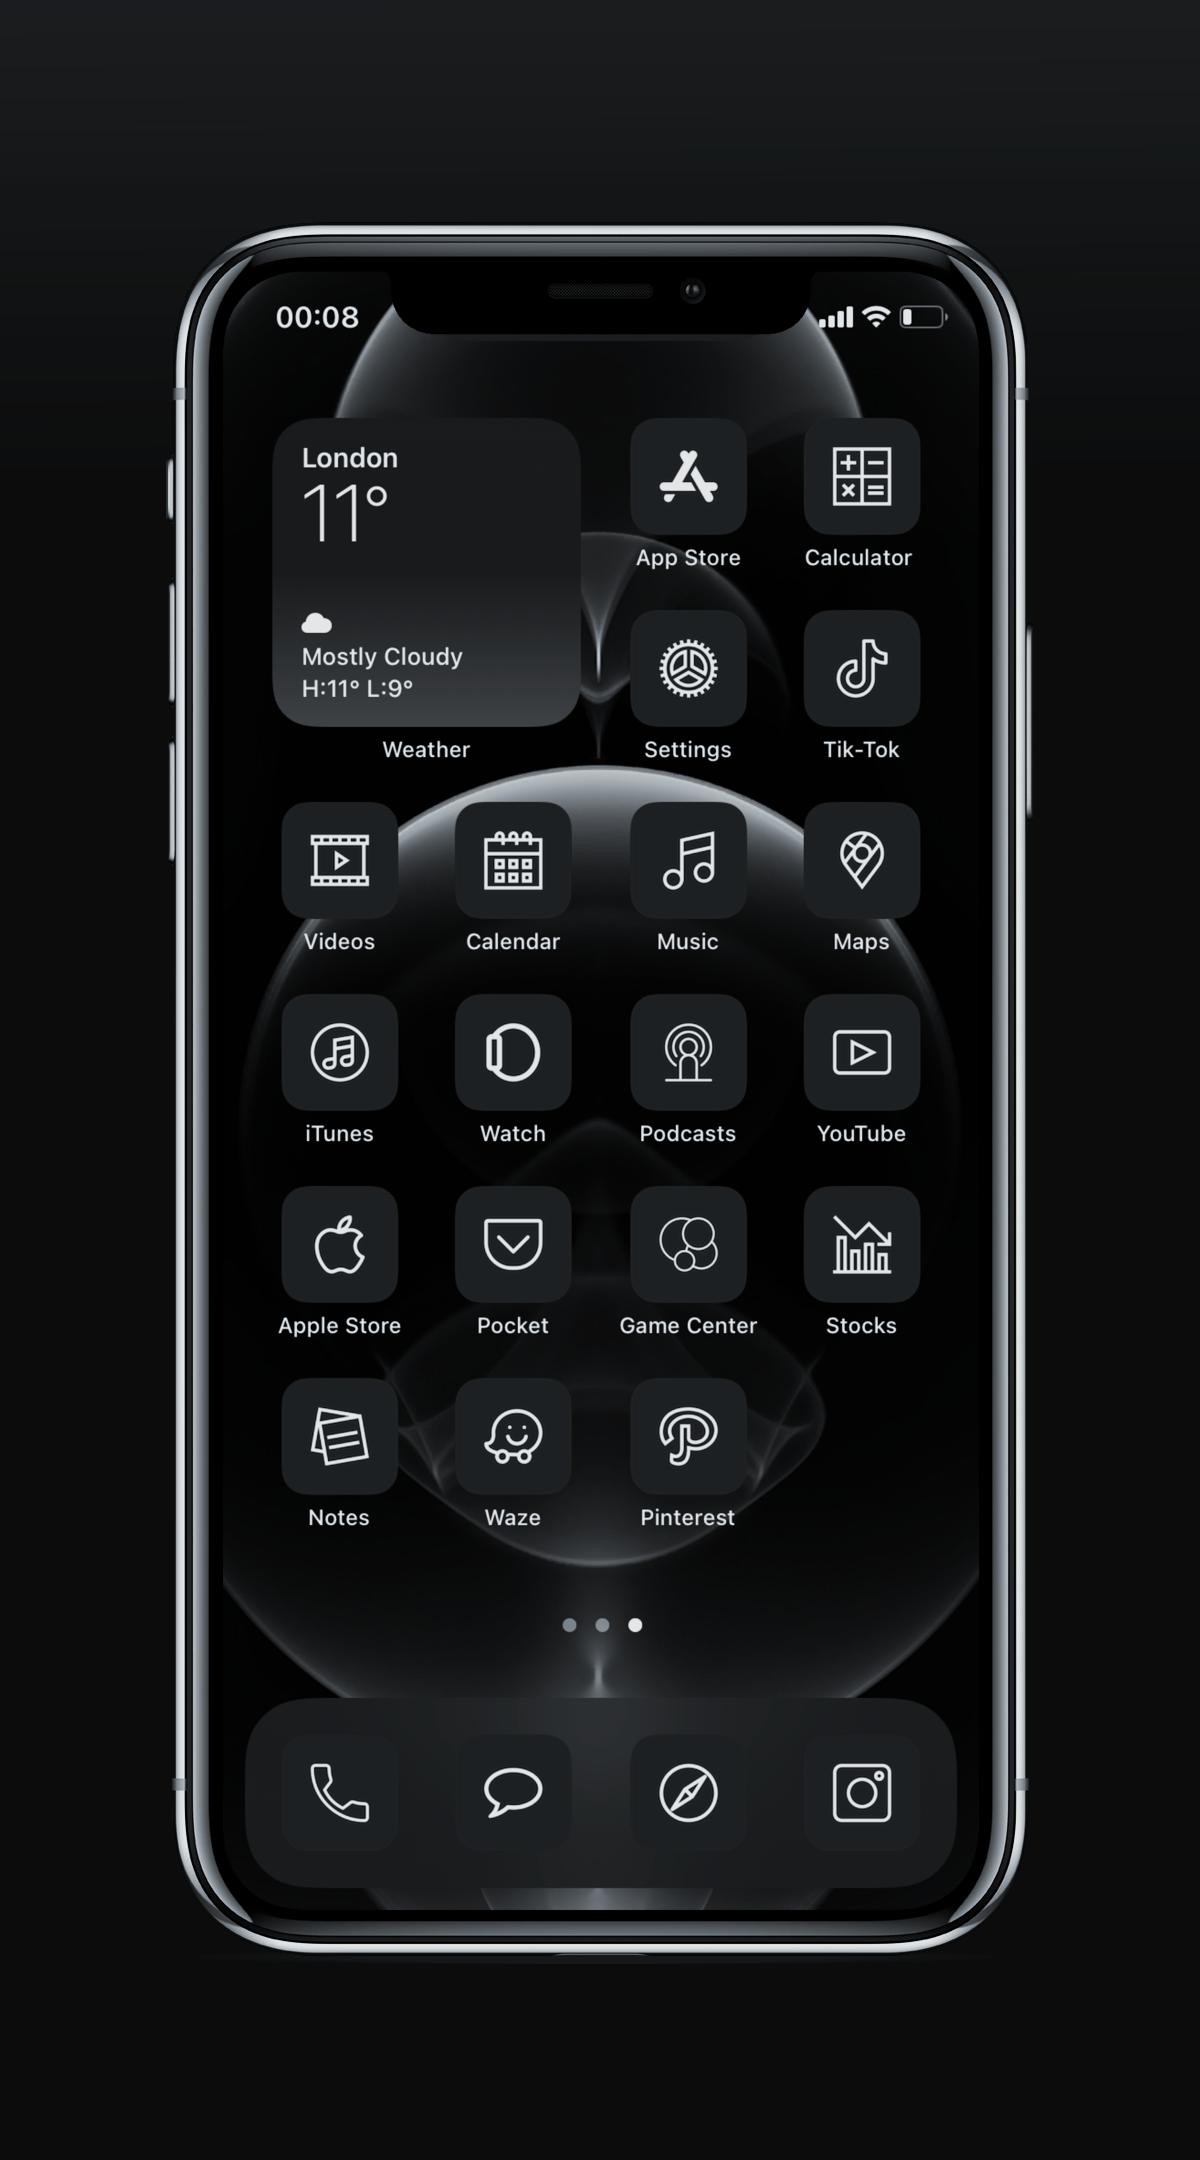 Ios 14 Graphite Homescreen Iphone 12 Pro Minimalistic Icons High Res 350 Icons Custom Made Homescreen Iphone Homescreen Minimalist Iphone